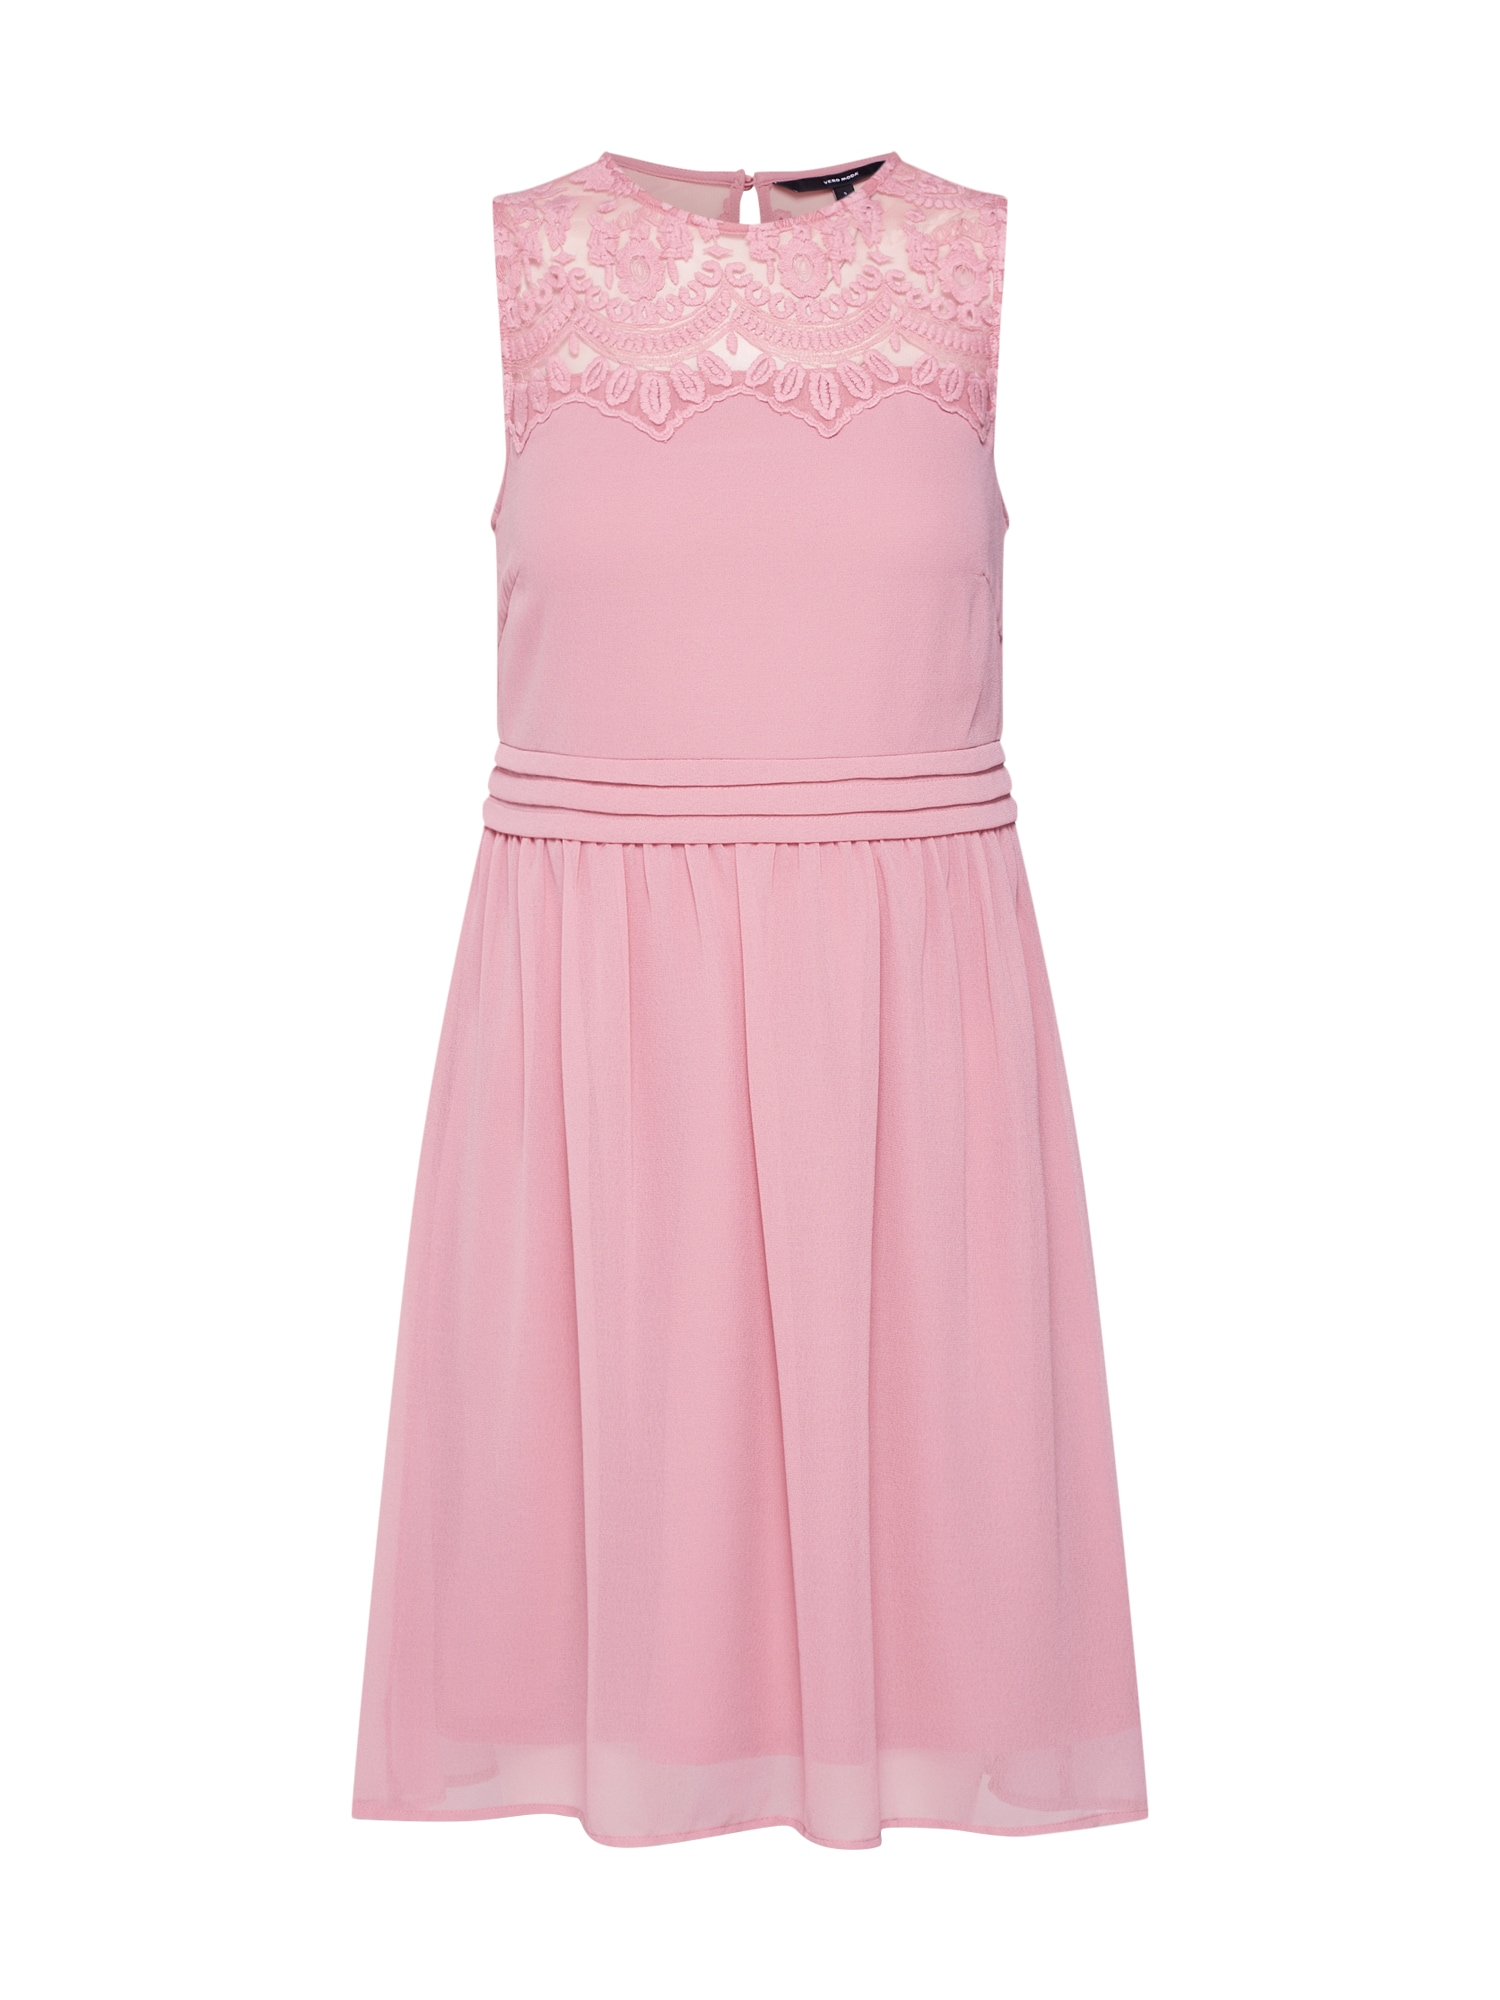 Letní šaty Vanessa růžová VERO MODA